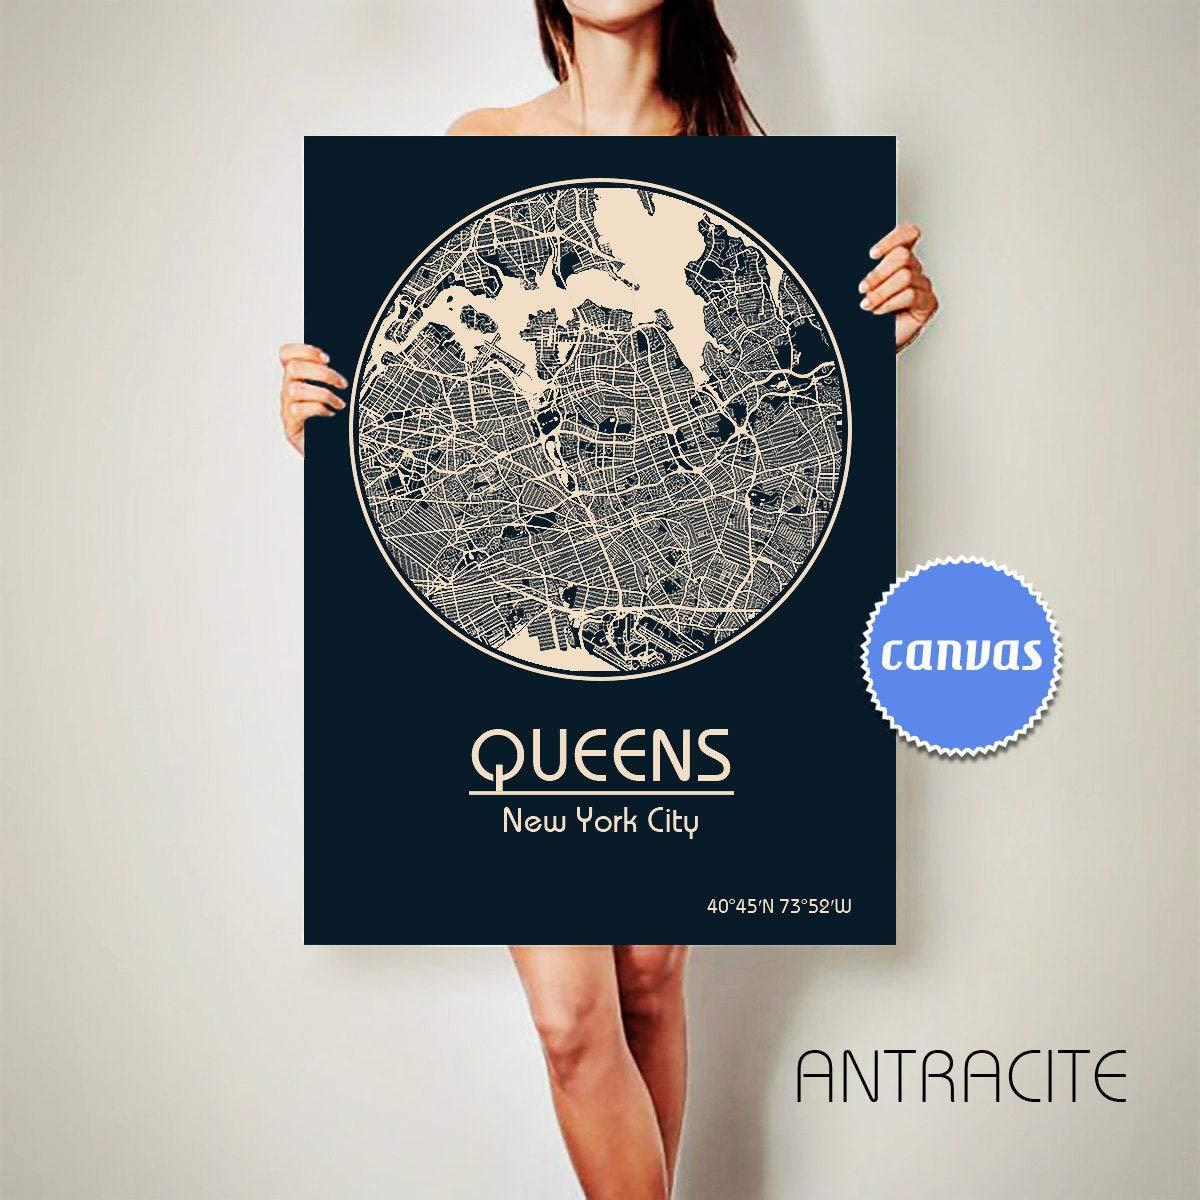 Queens New York キャンバス地図 クイーンズ ニューヨークポスター シティマップ クイーンズ アートプリント クイーンズ ニューヨーク州 30x40 cm CAZVAS-22586-1 30x40 cm フレームなし B07QHFM3QR